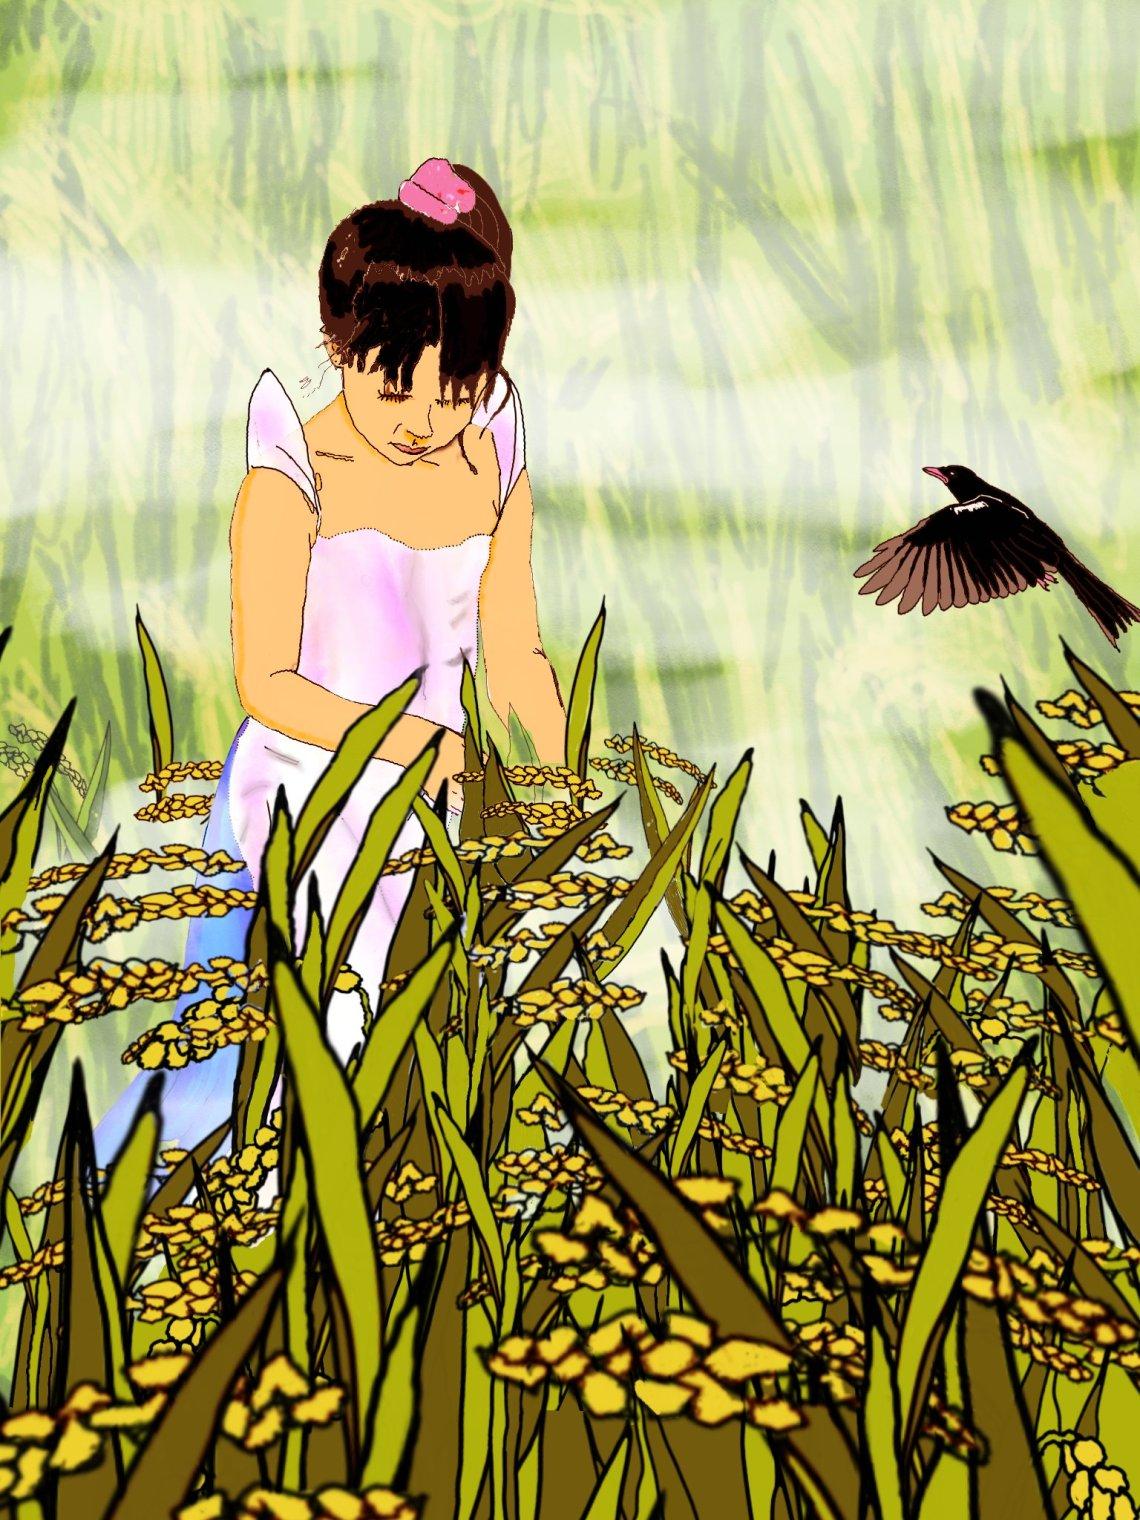 Digital drawing of Filipino rice girl and bird